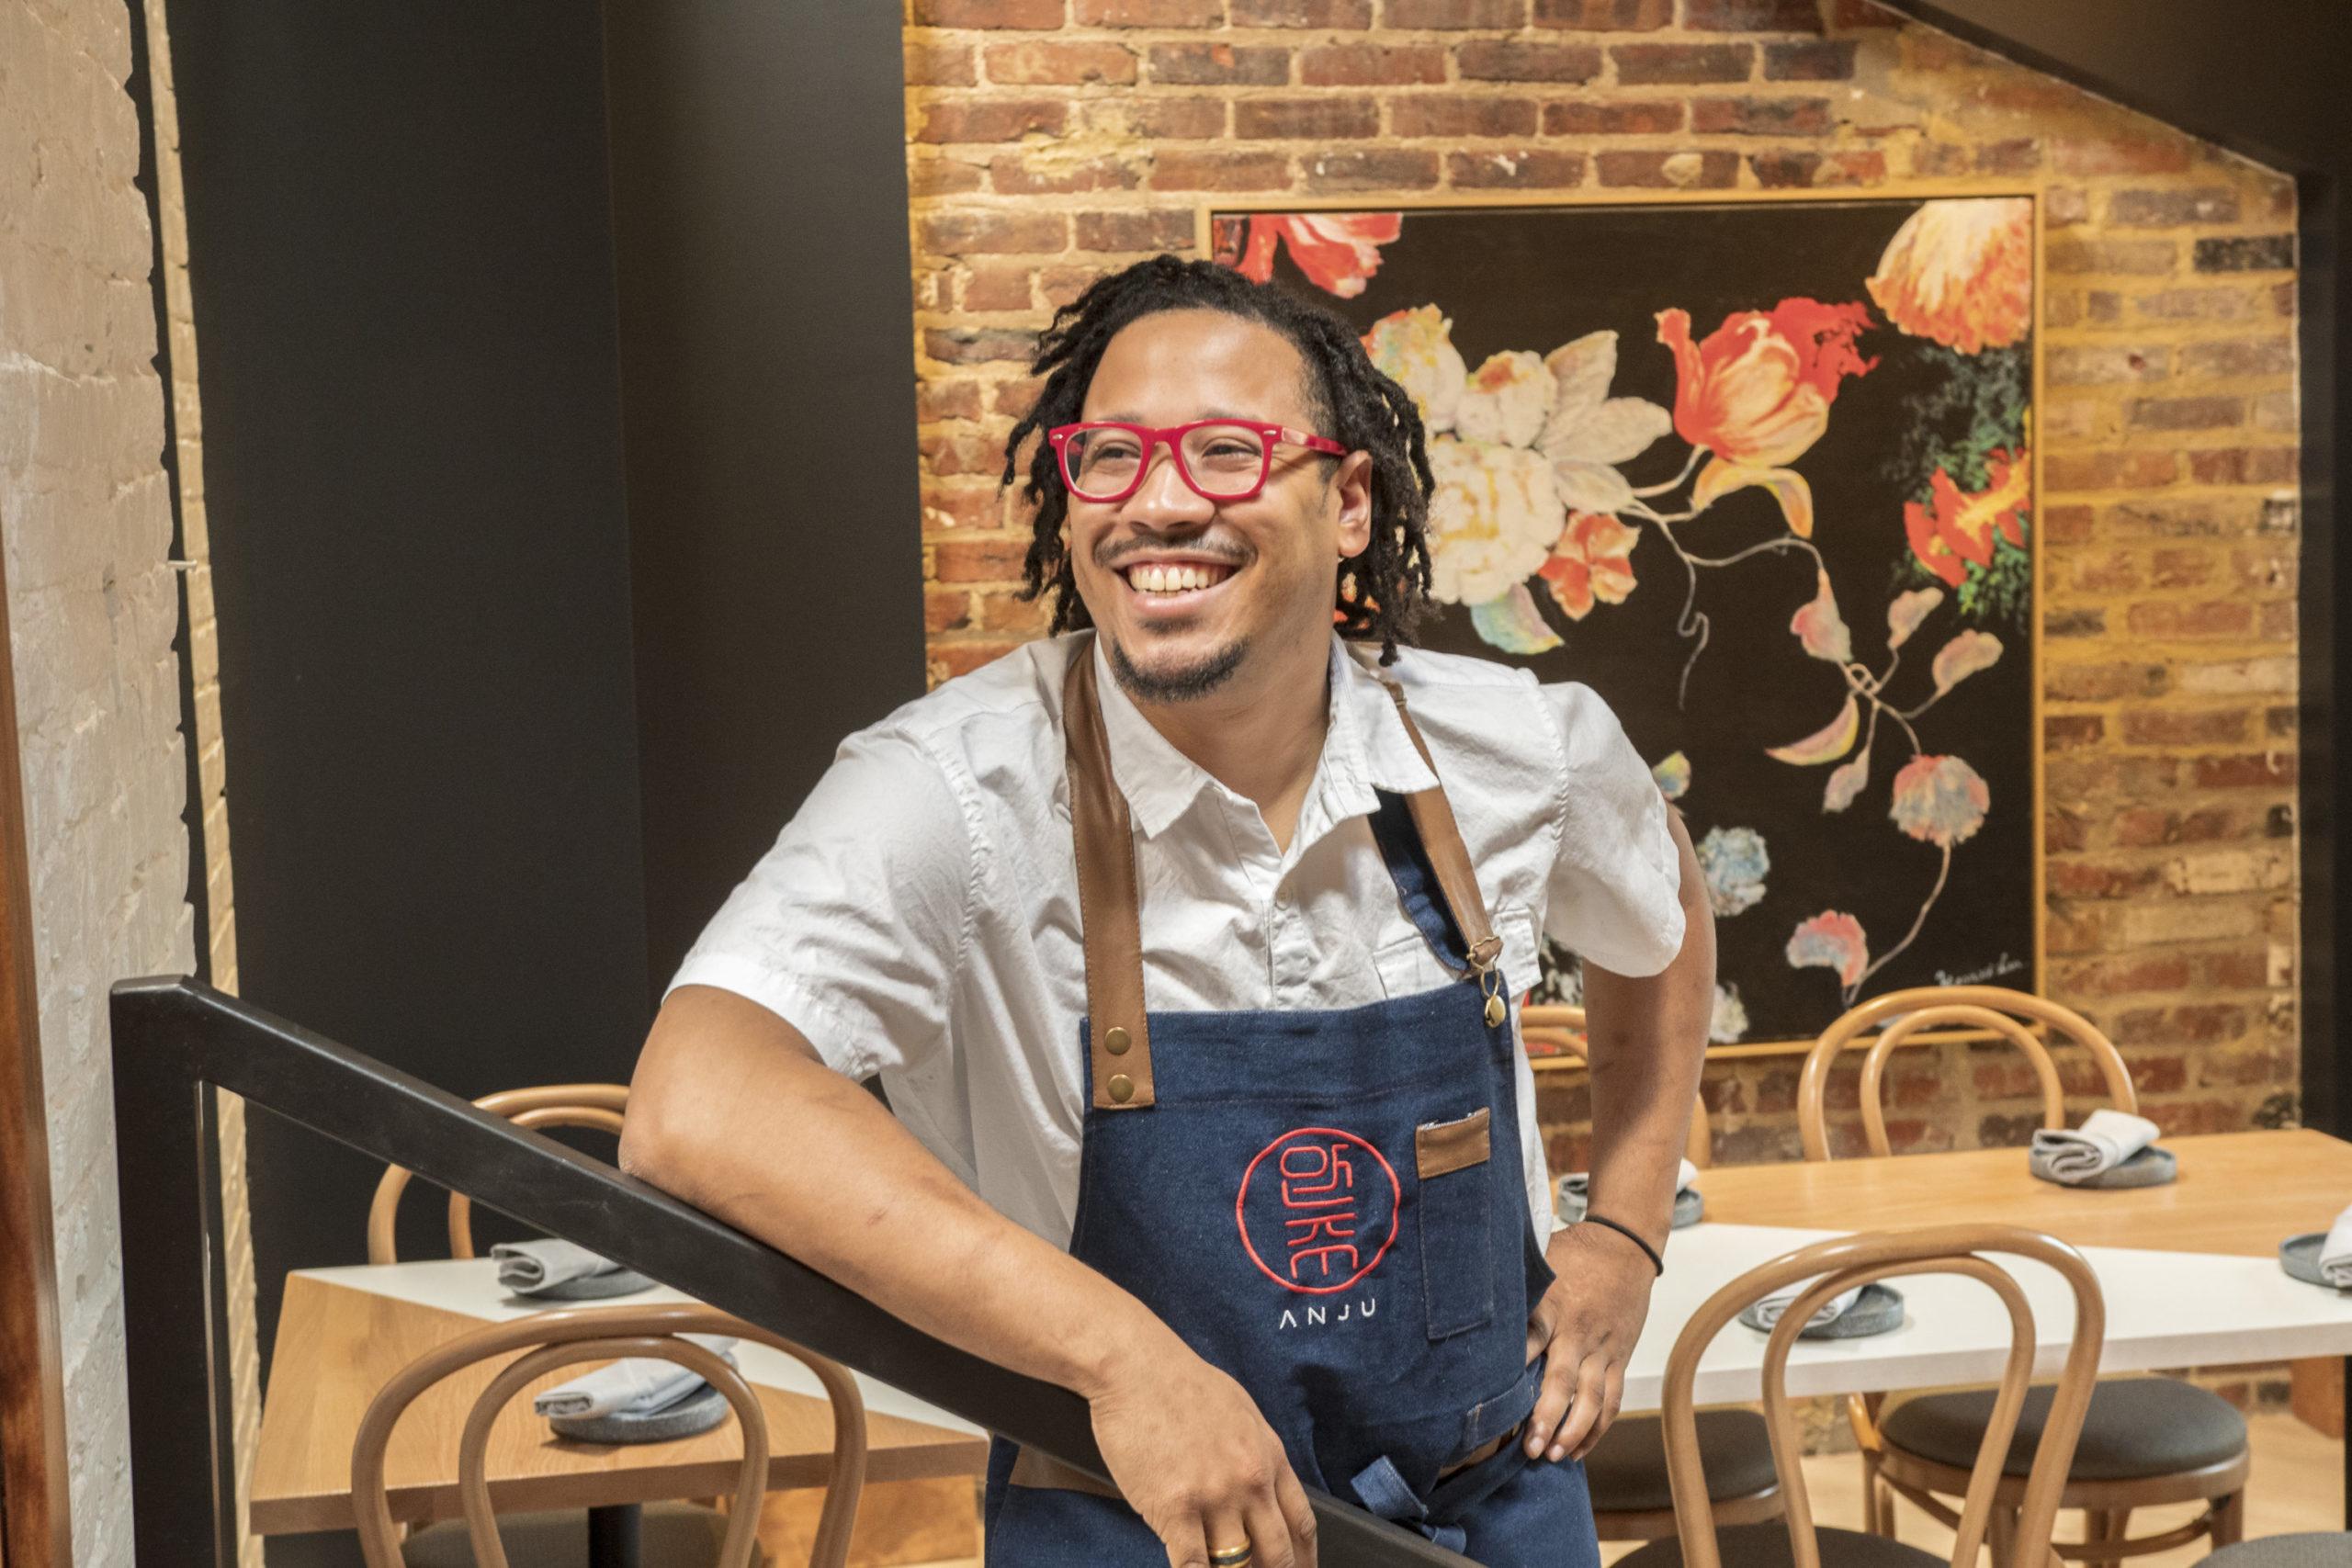 Anju executive chef Angel Barreto